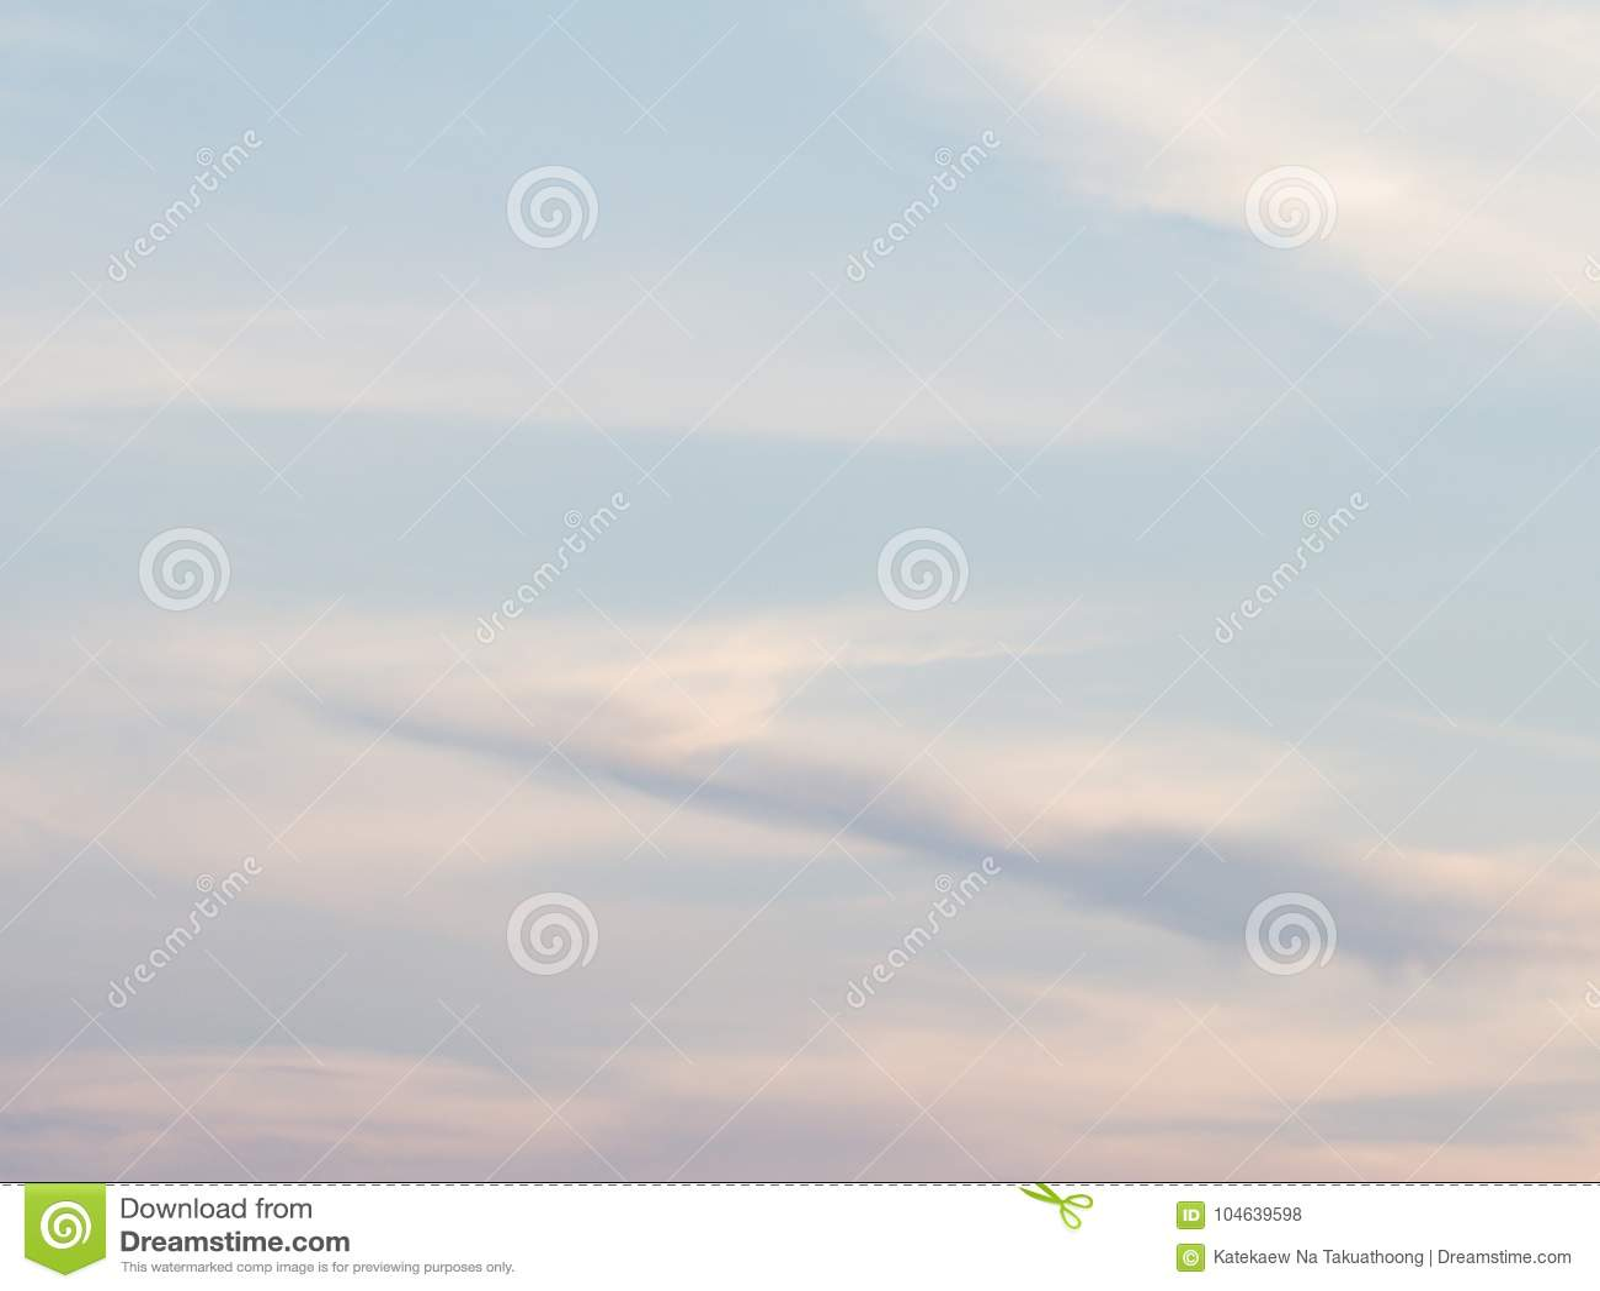 Download Mooie Bewolkte Blauwe Hemel Stock Foto - Afbeelding bestaande uit avond, hemel: 104639598